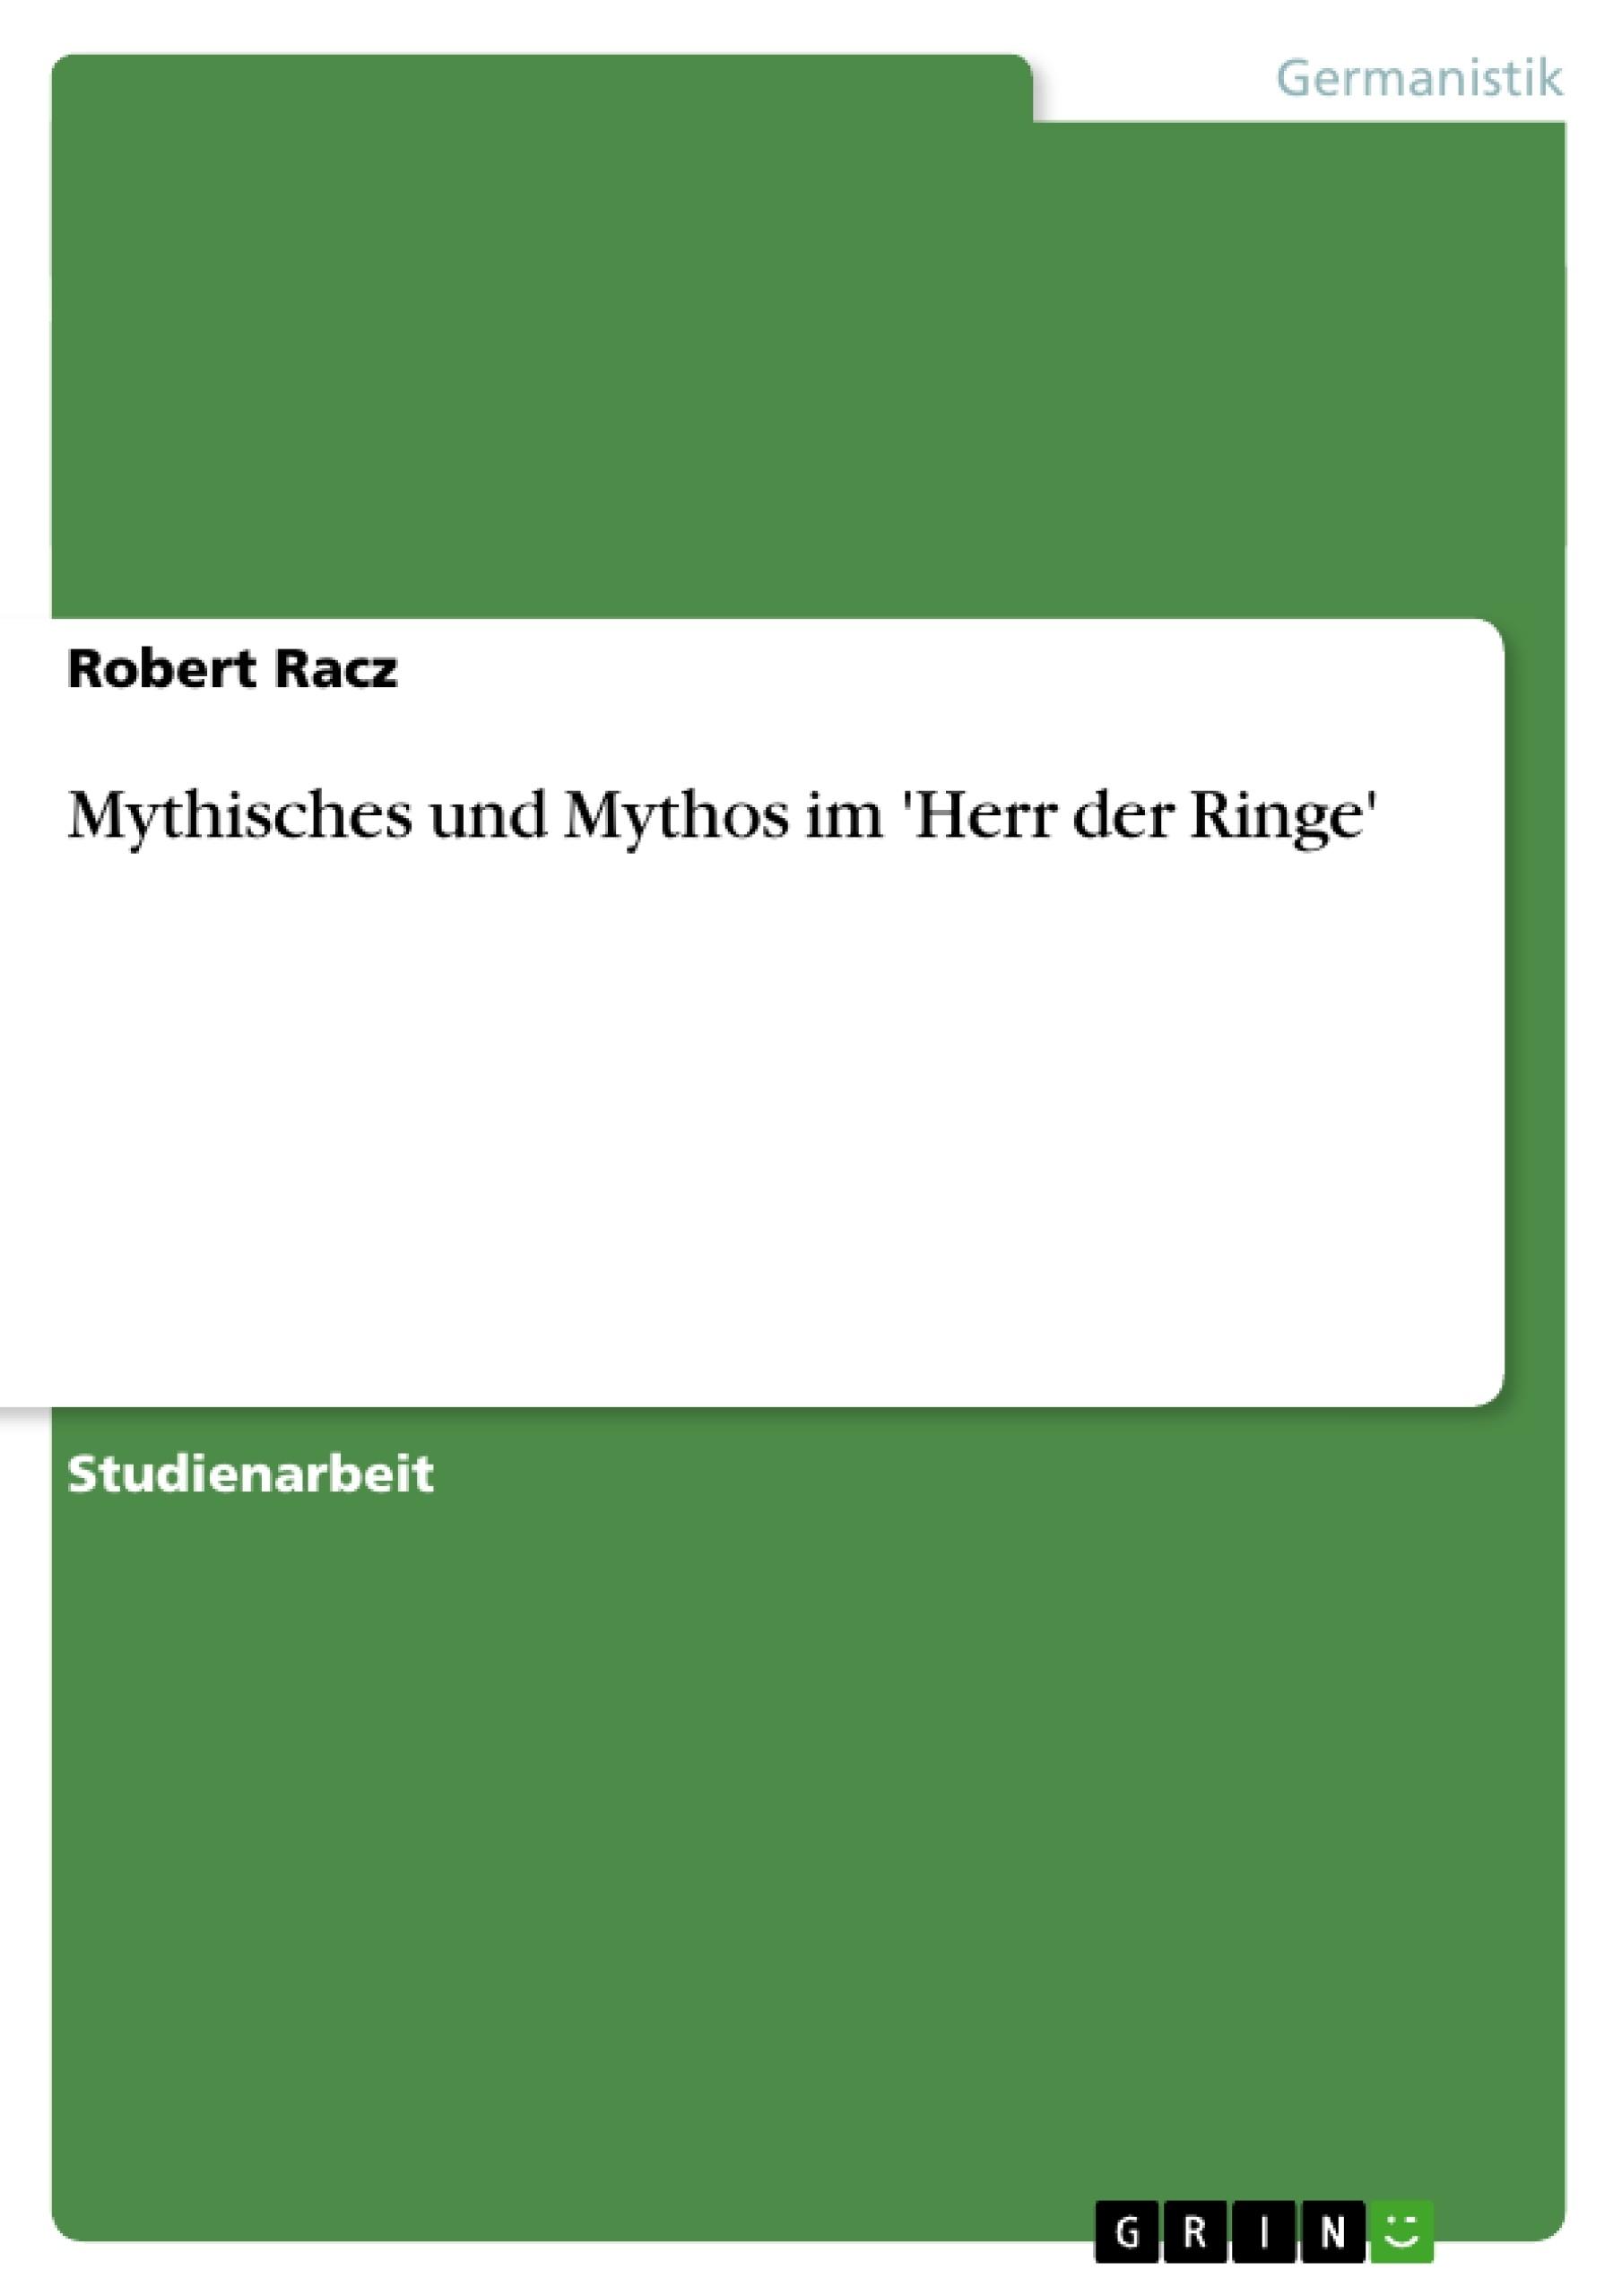 Titel: Mythisches und Mythos im 'Herr der Ringe'